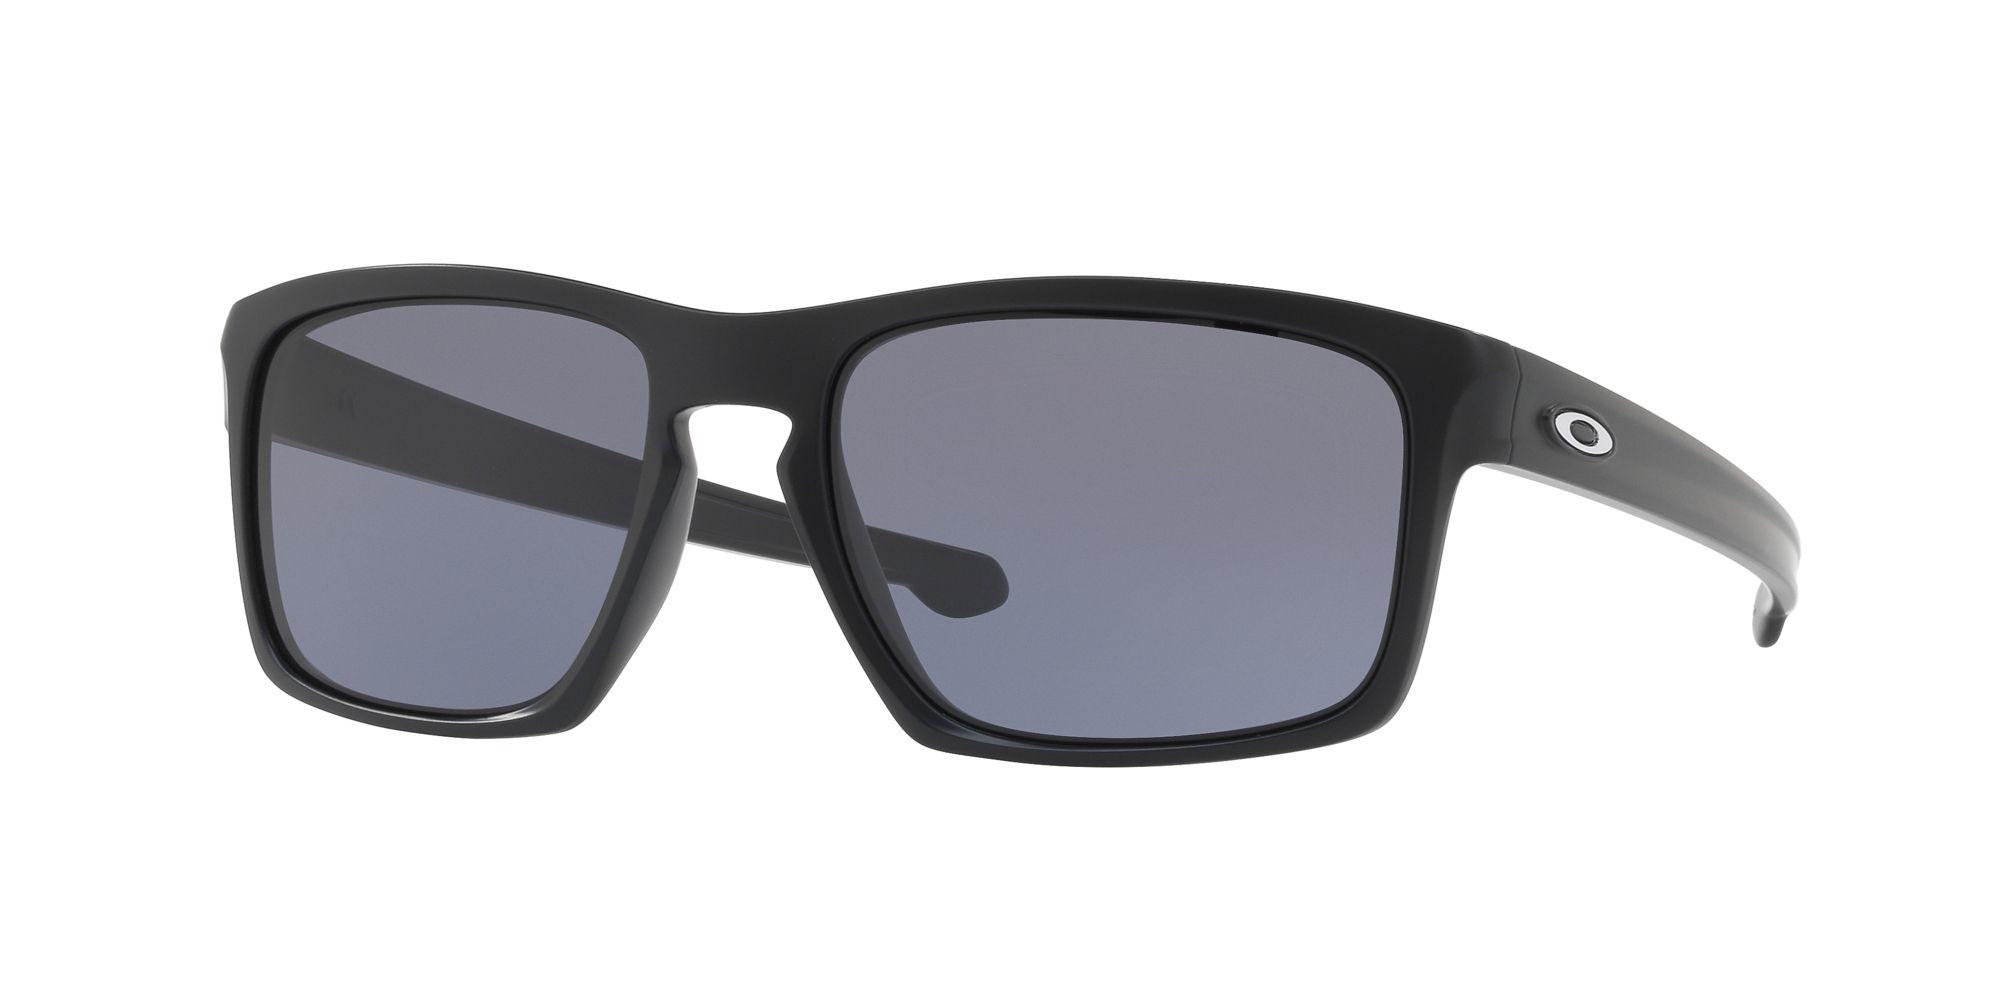 Oakley Sliver Medium Sunglasses - OO 9262-01